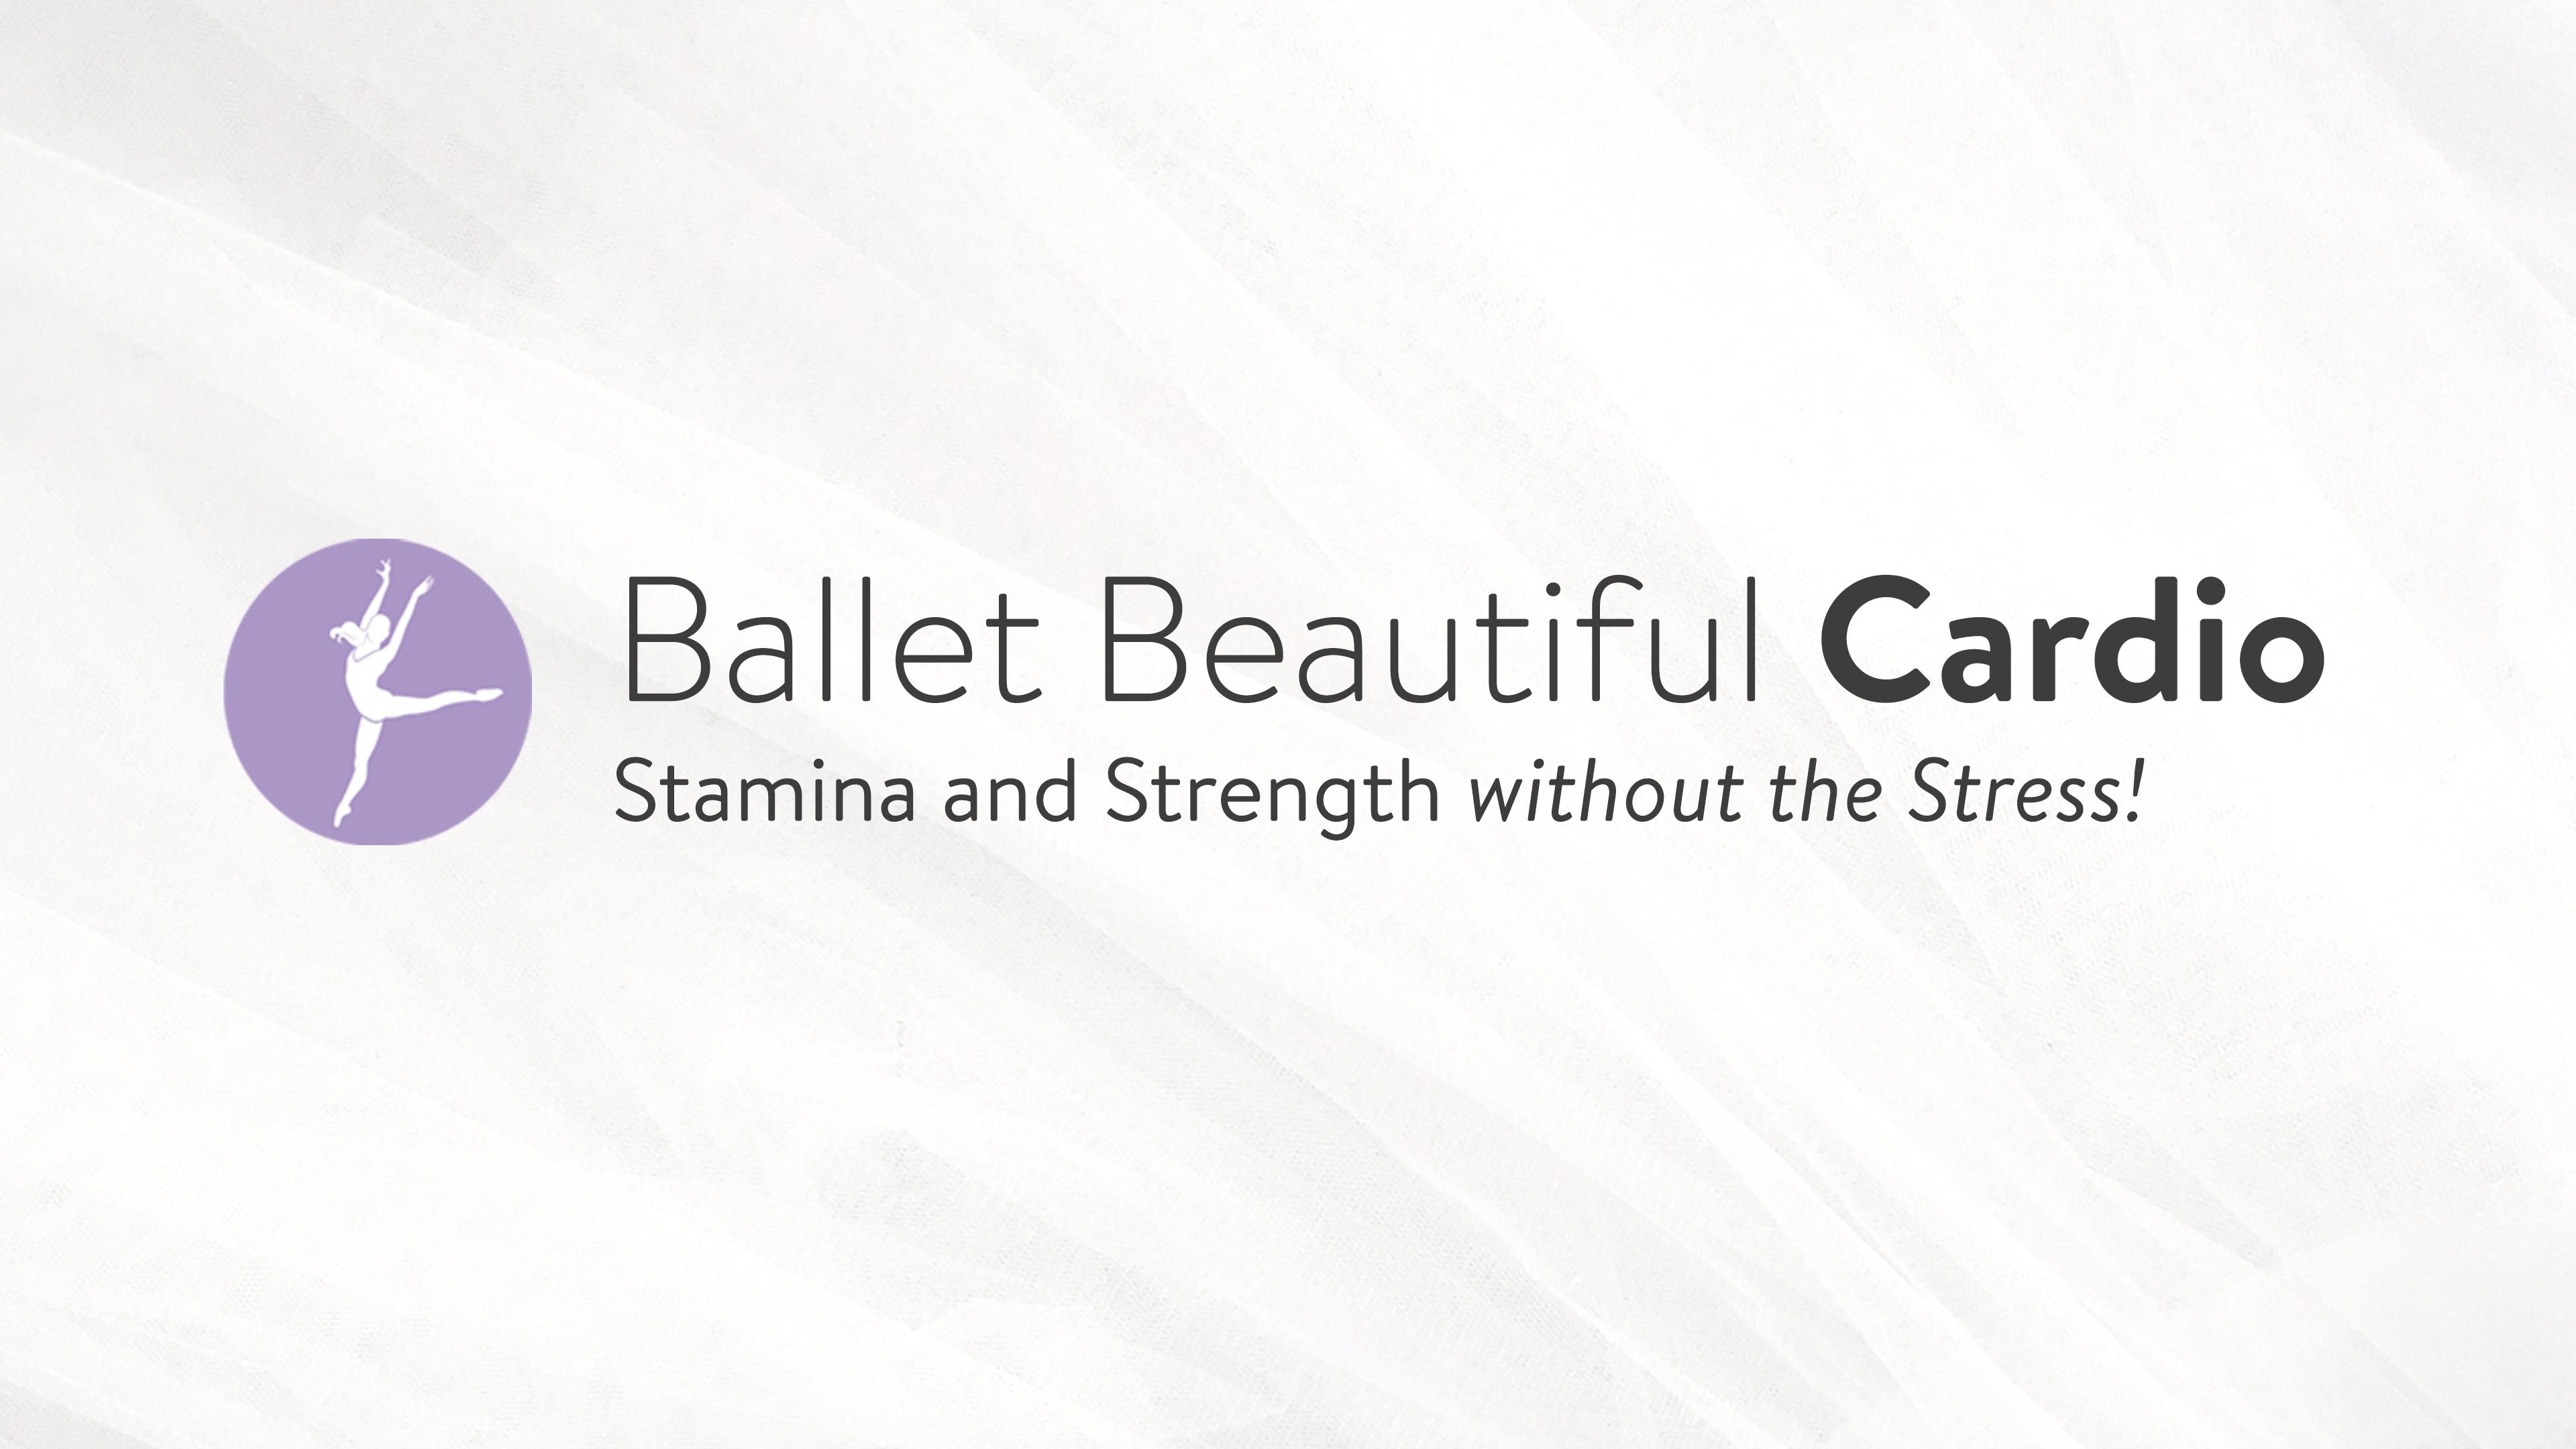 Ballet Beautiful Cardio